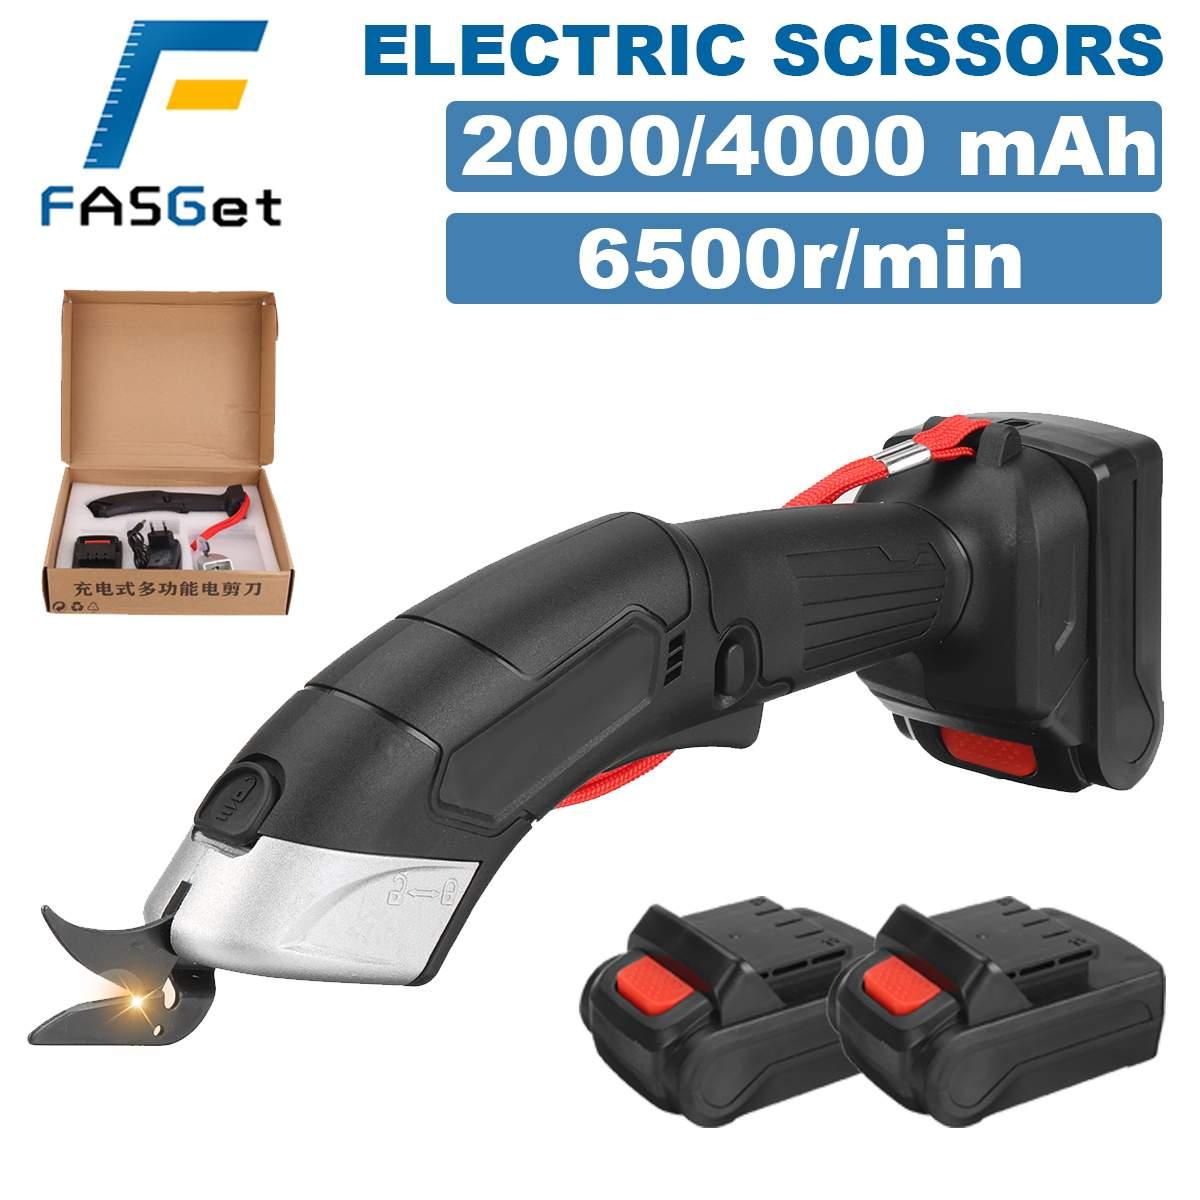 FASGet 12 فولت متعددة الوظائف مقص كهربائي لاسلكي انخفاض استهلاك مرنة الكهربائية مقص القماش والجلود أداة قطع القماش